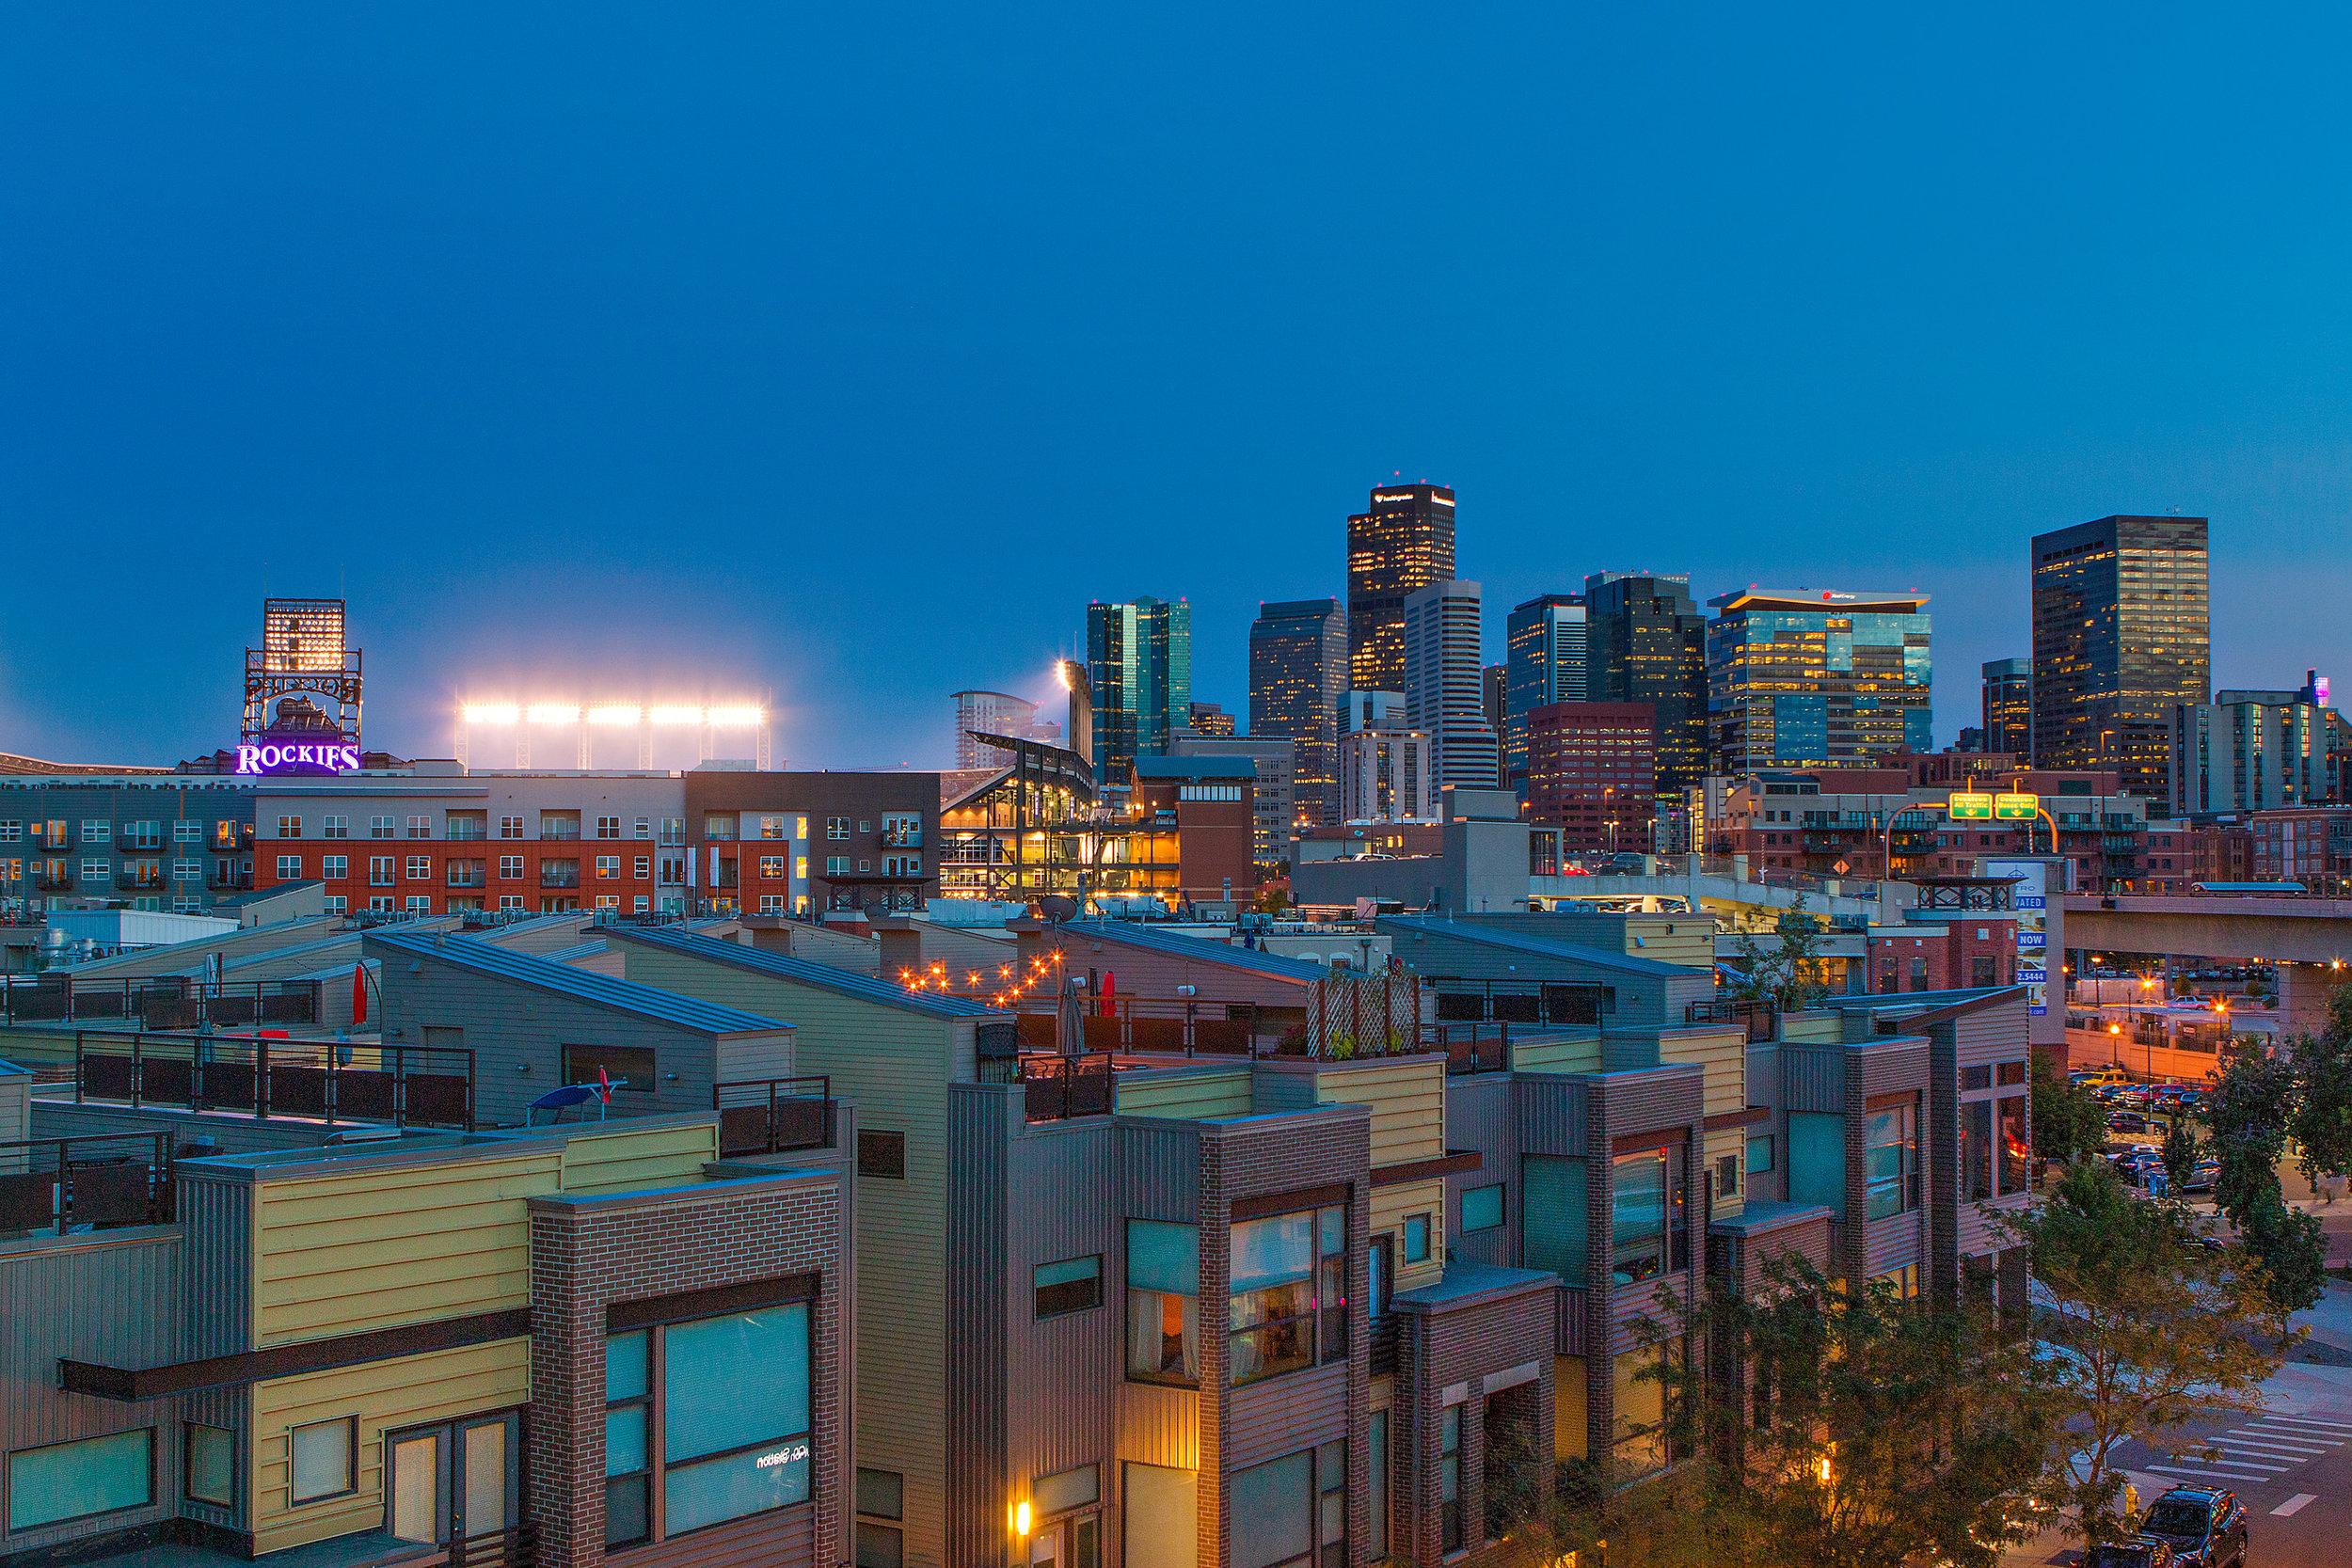 Rockies and Downtown Views.jpg